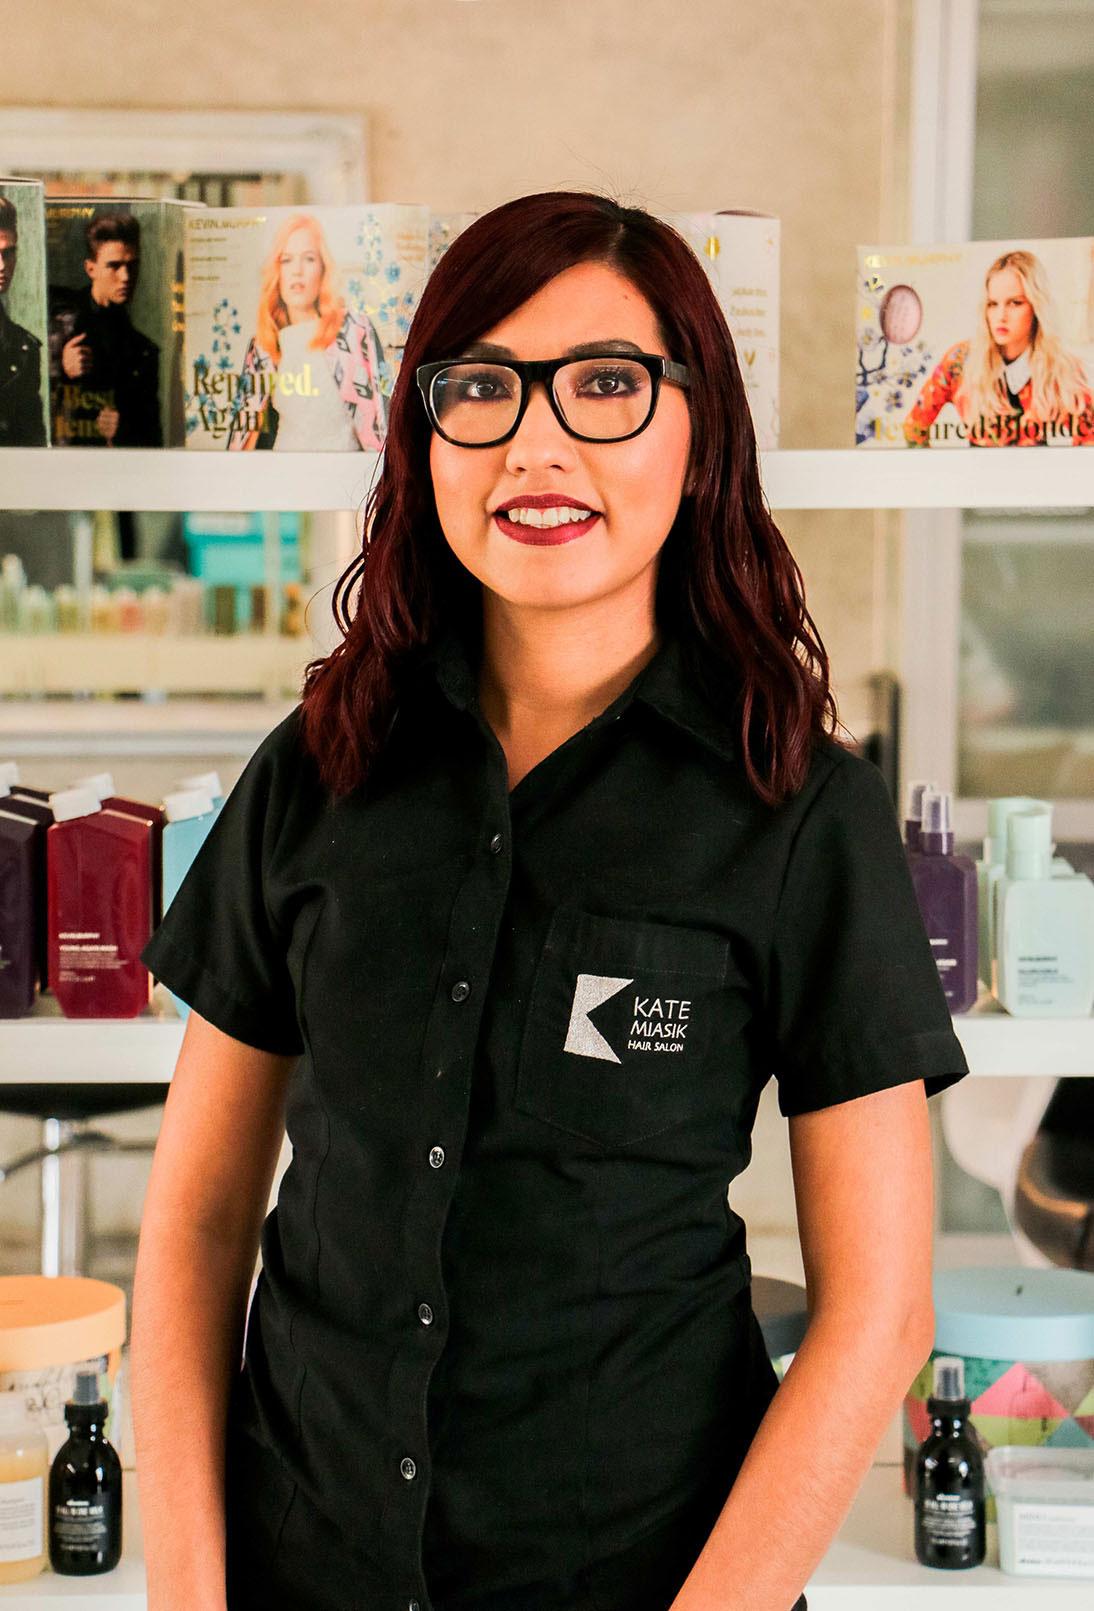 Laura - Kate Miasik Salon